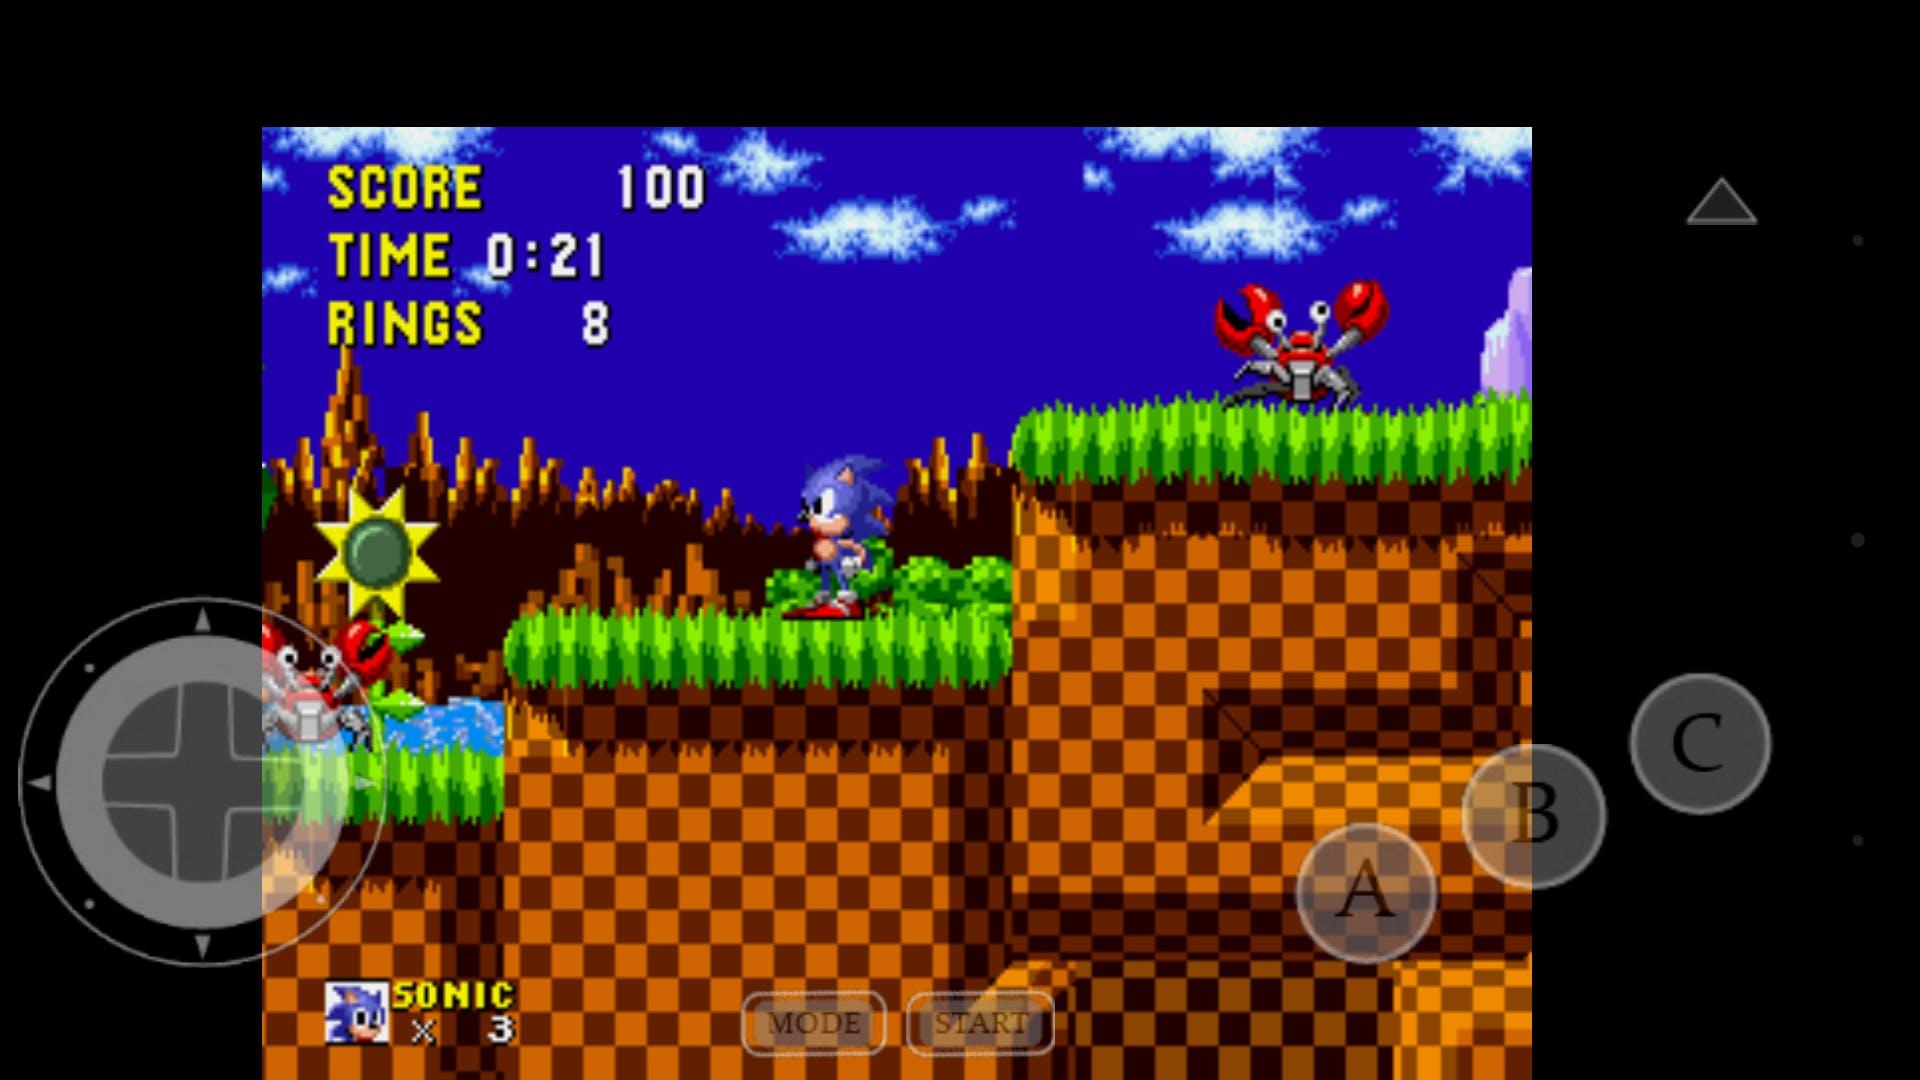 """Sonic the Hedgehog"" emulated on MD.emu"